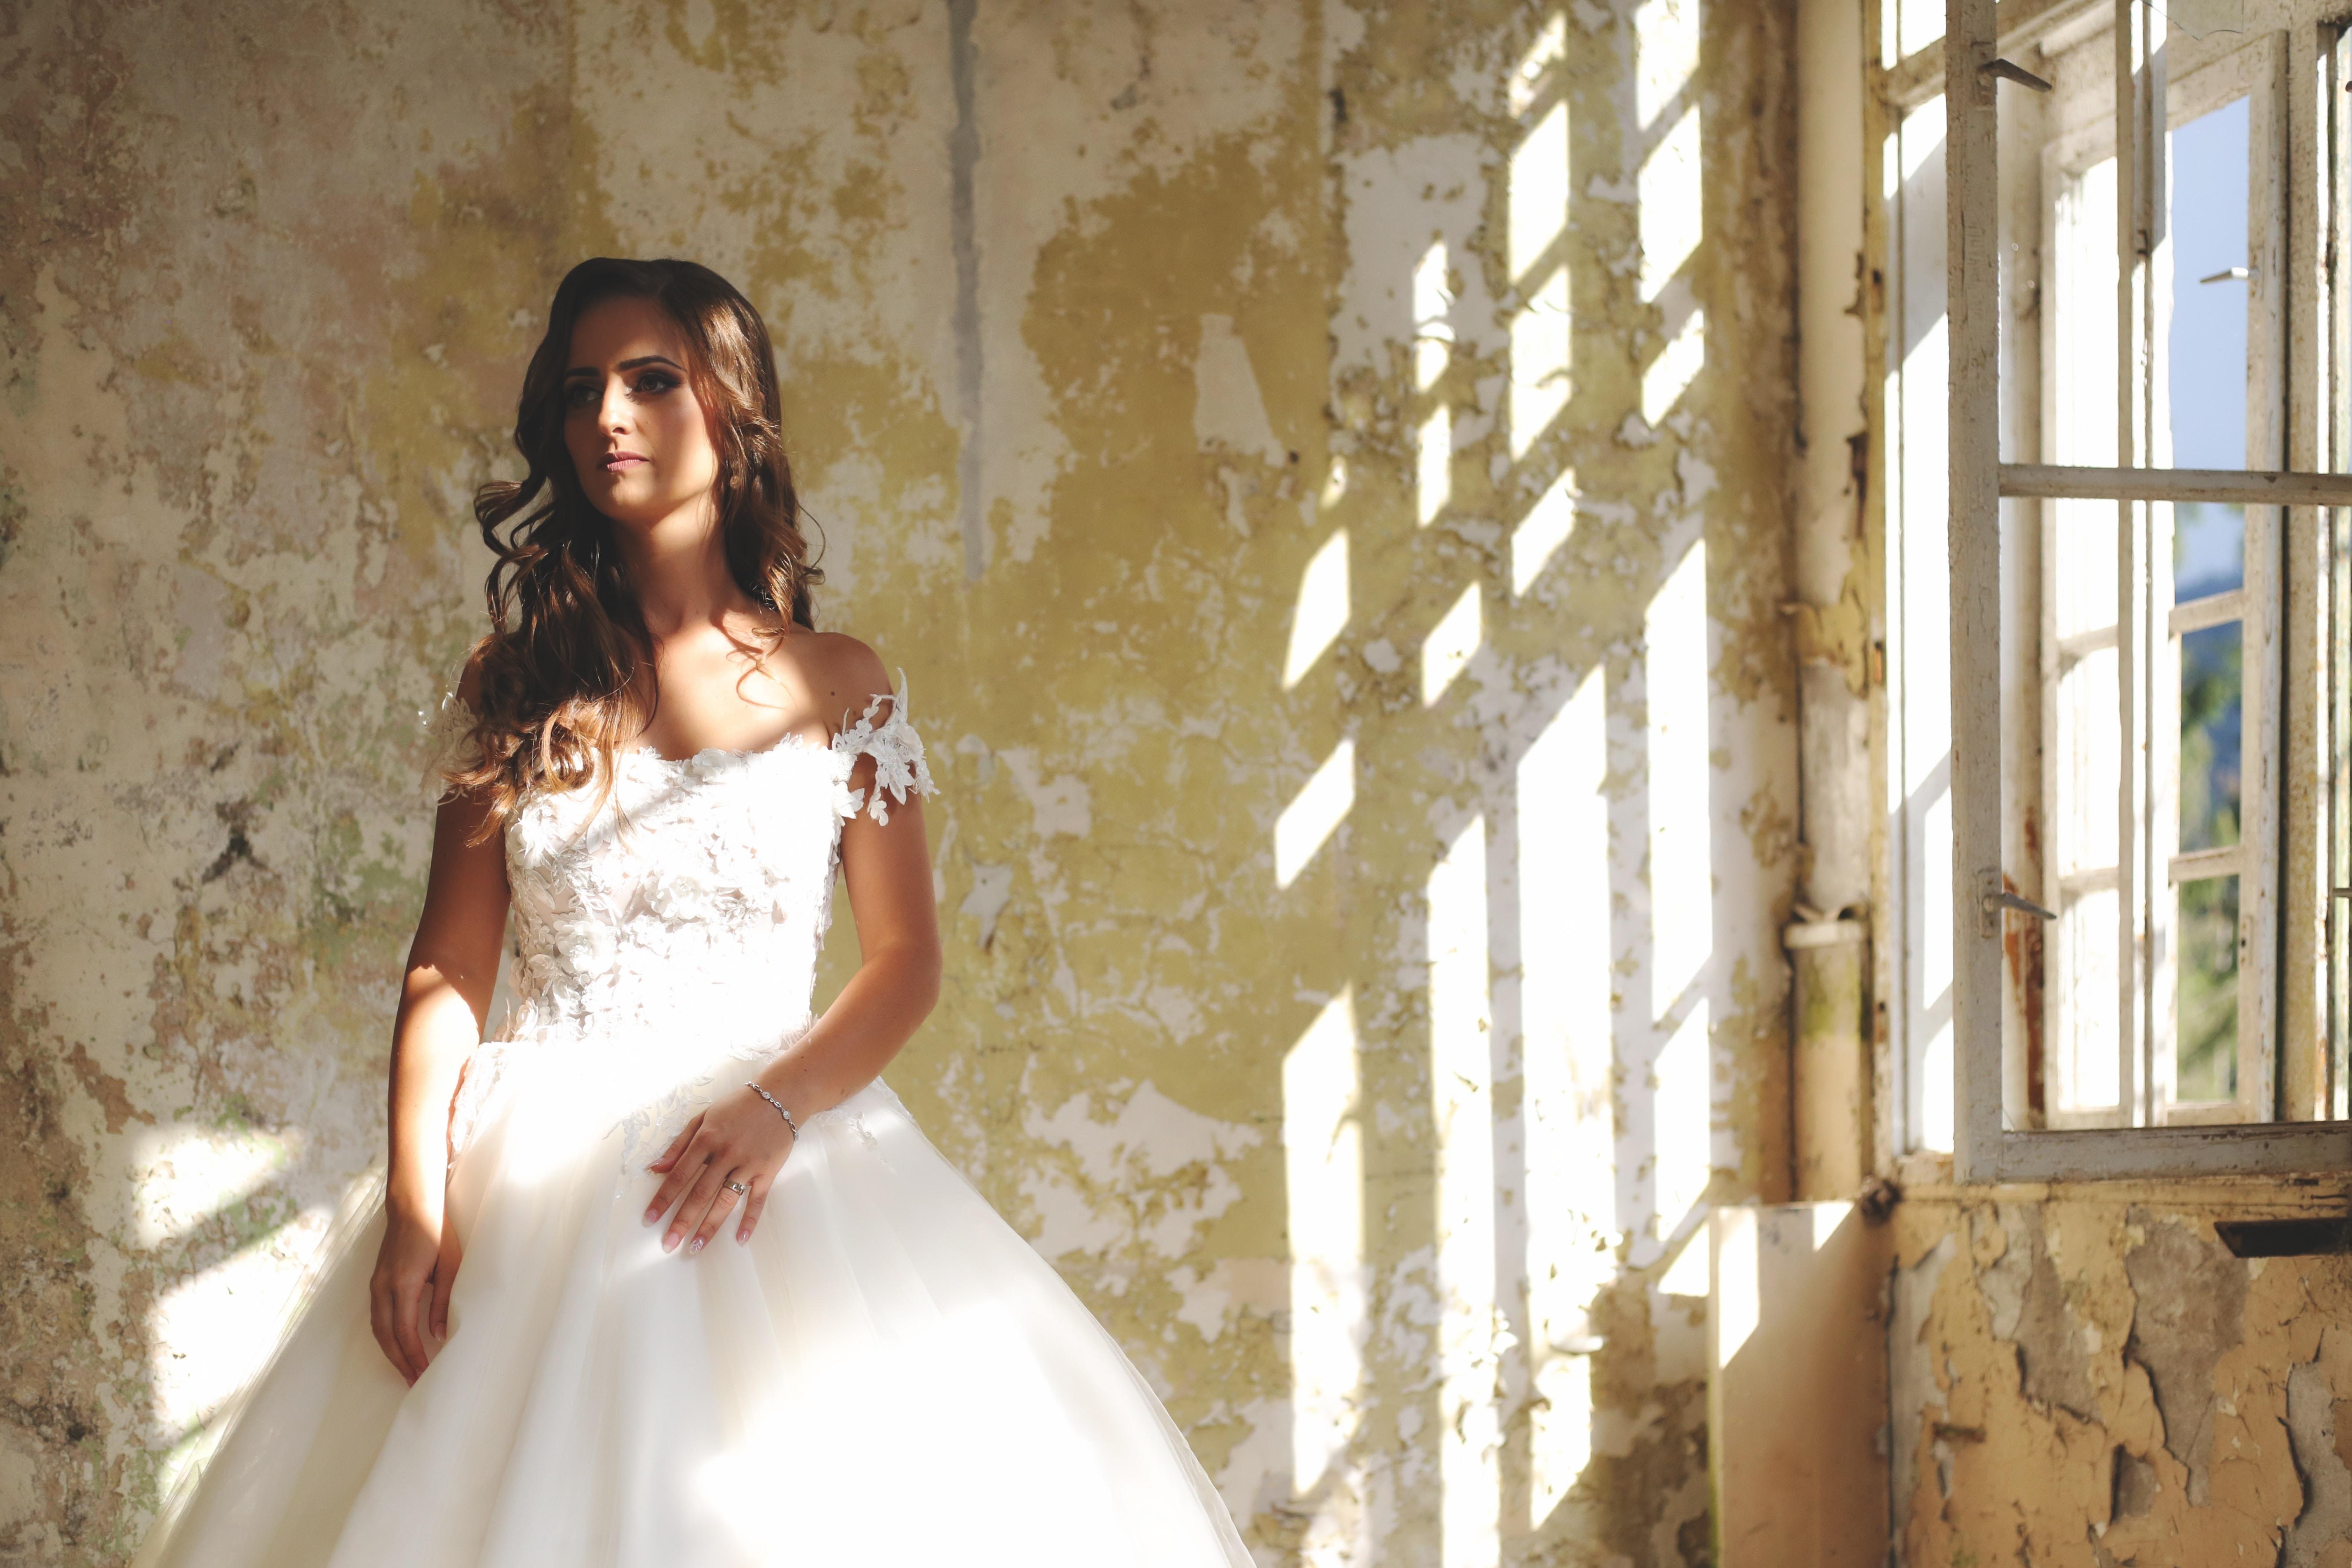 woman in bridal gown standing near window